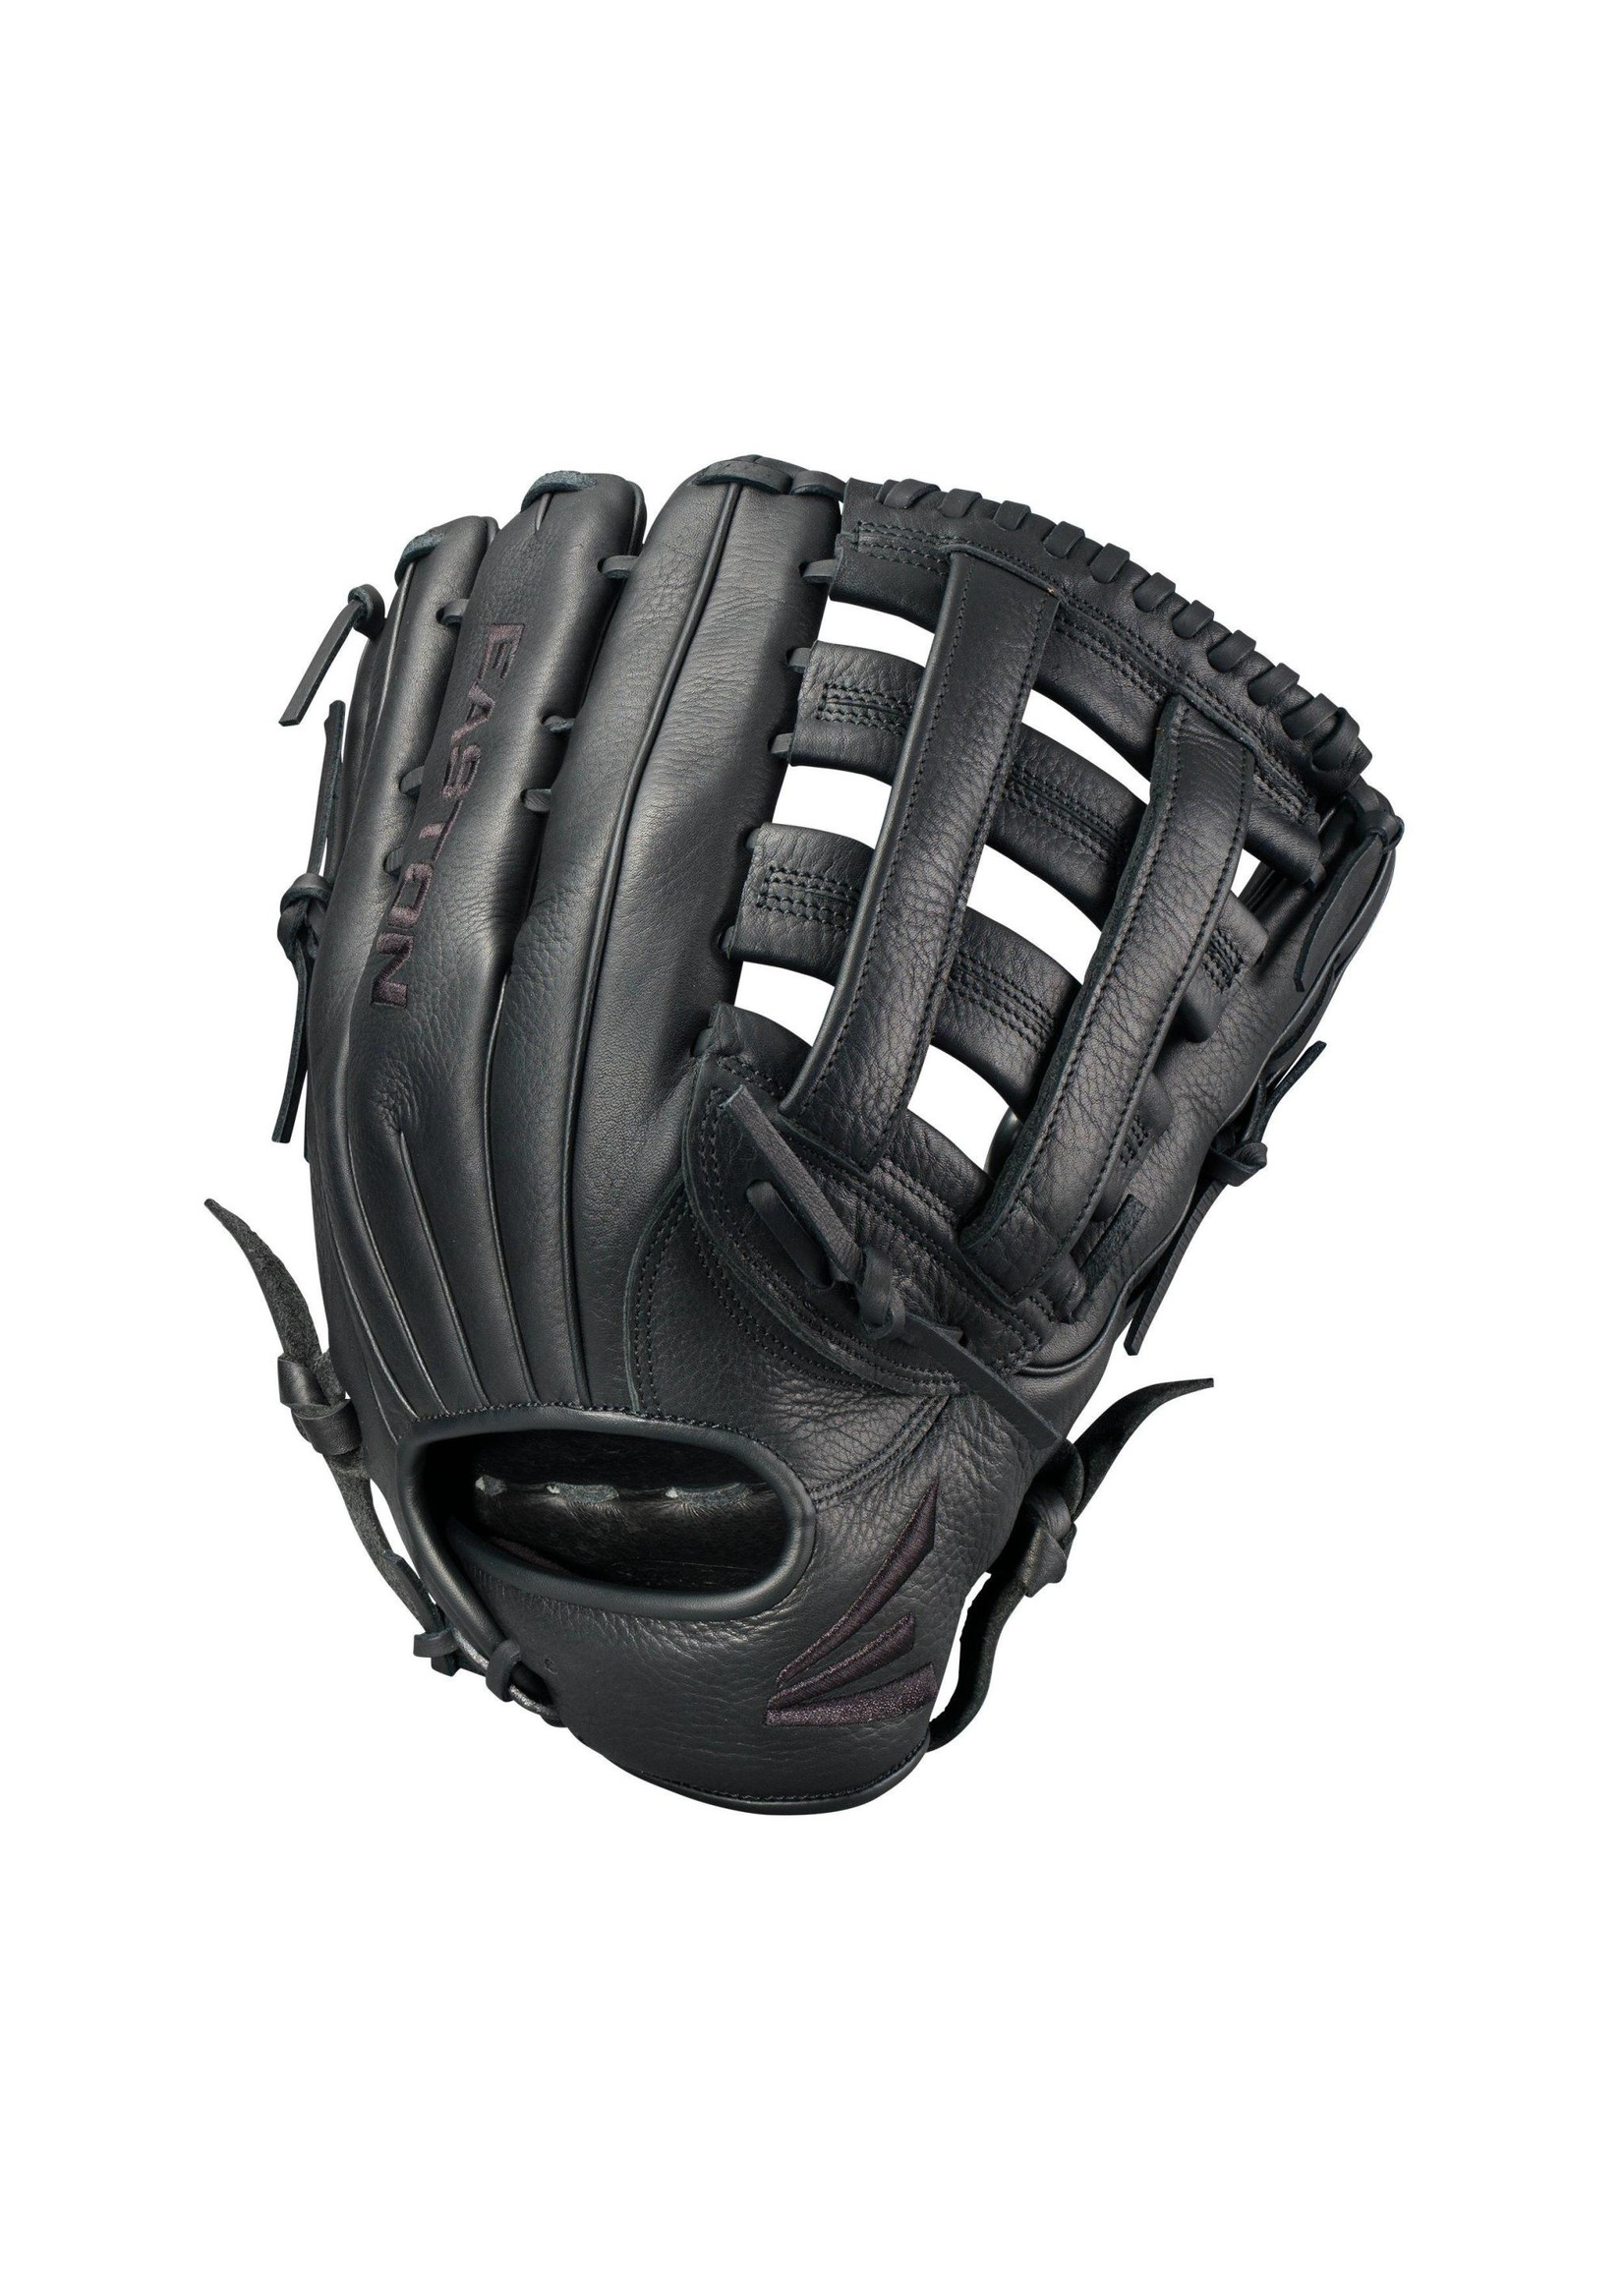 Easton Baseball (Canada) EASTON BLACKSTONE 14 INCHES DUAL H